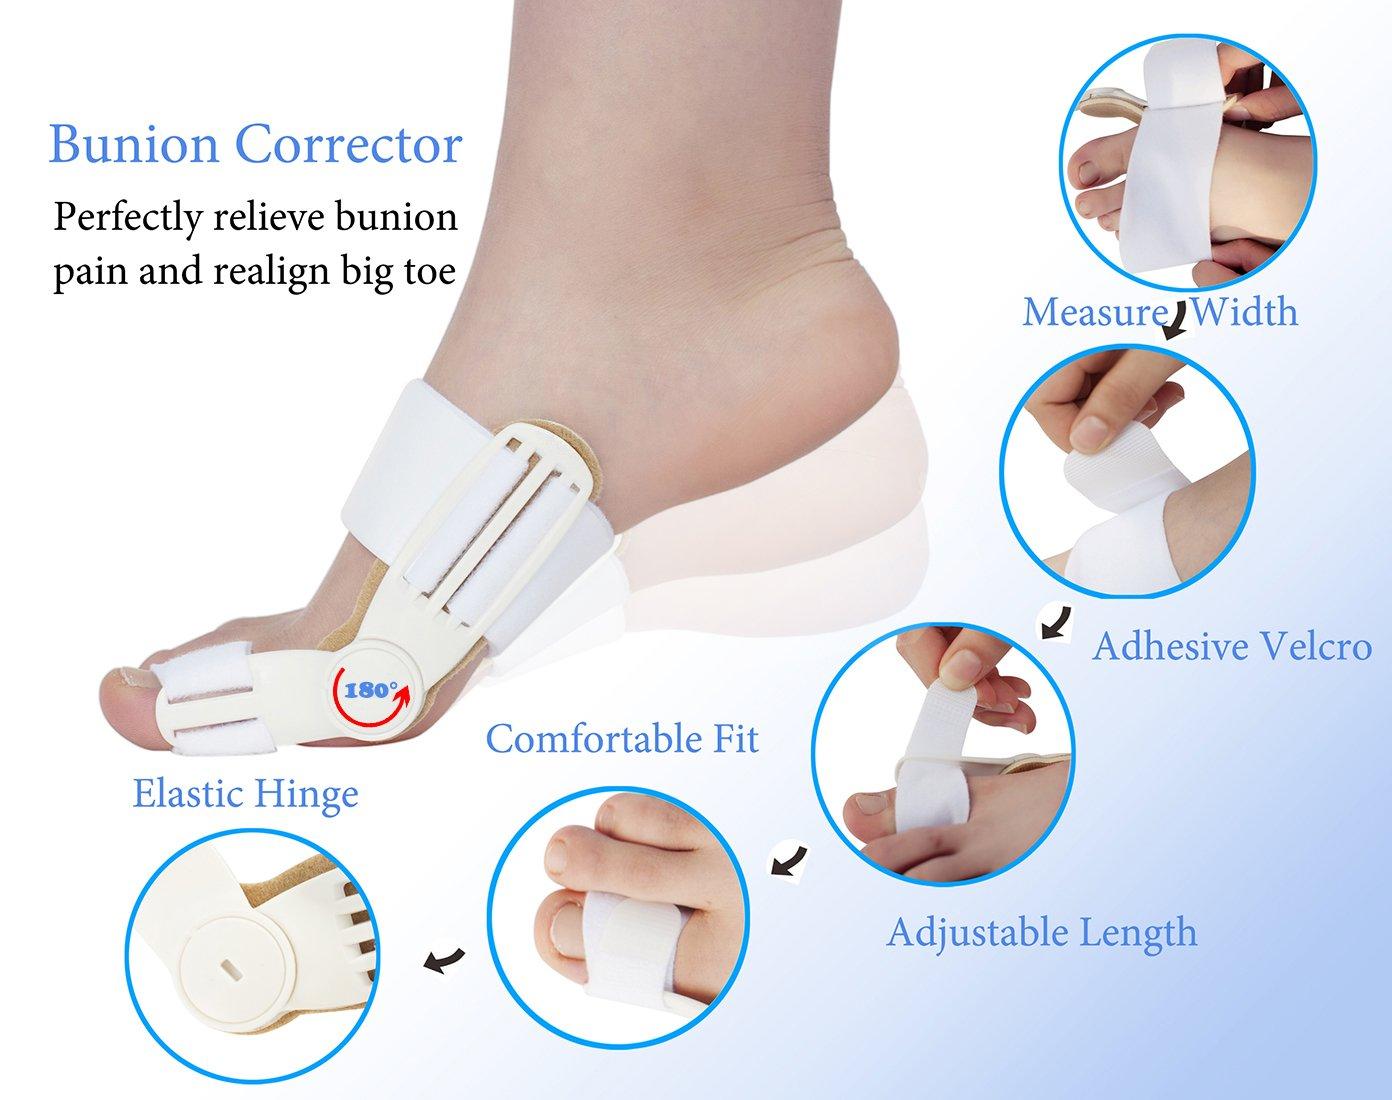 Amazon.com : Bunion Corrector & Small Toe Separator for Bunion Hallux Valgus Pain Relief and Gel Toe Separators, Bunion Toe Straighteners-2 Day Correctors ...